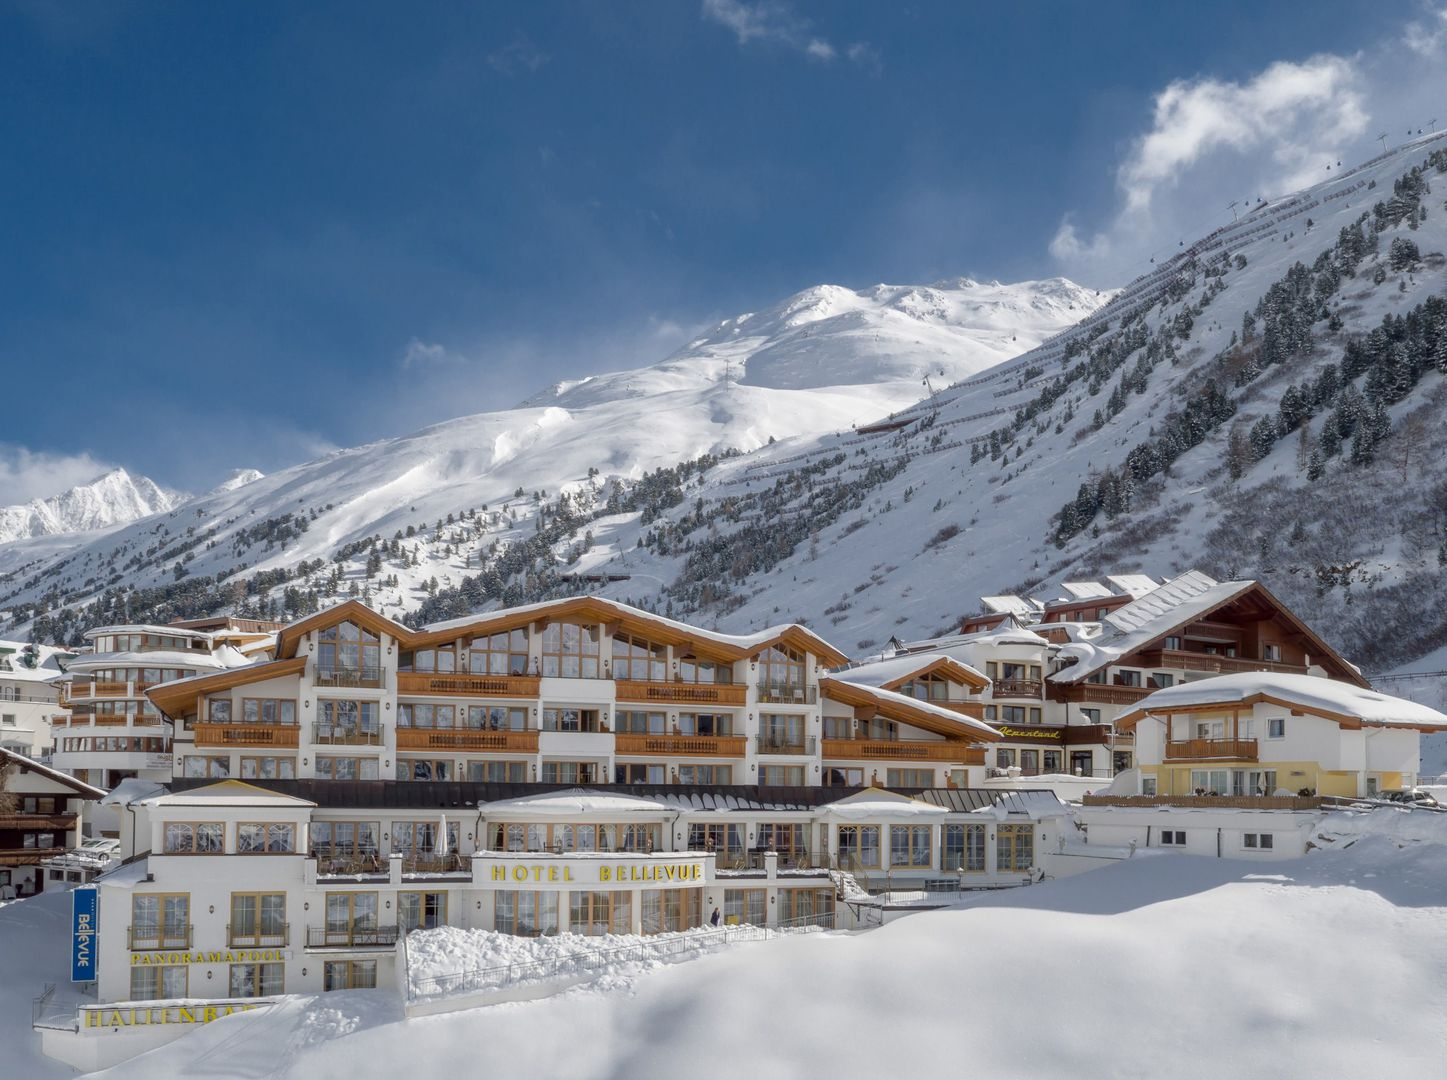 Hotel Austria & Bellev...